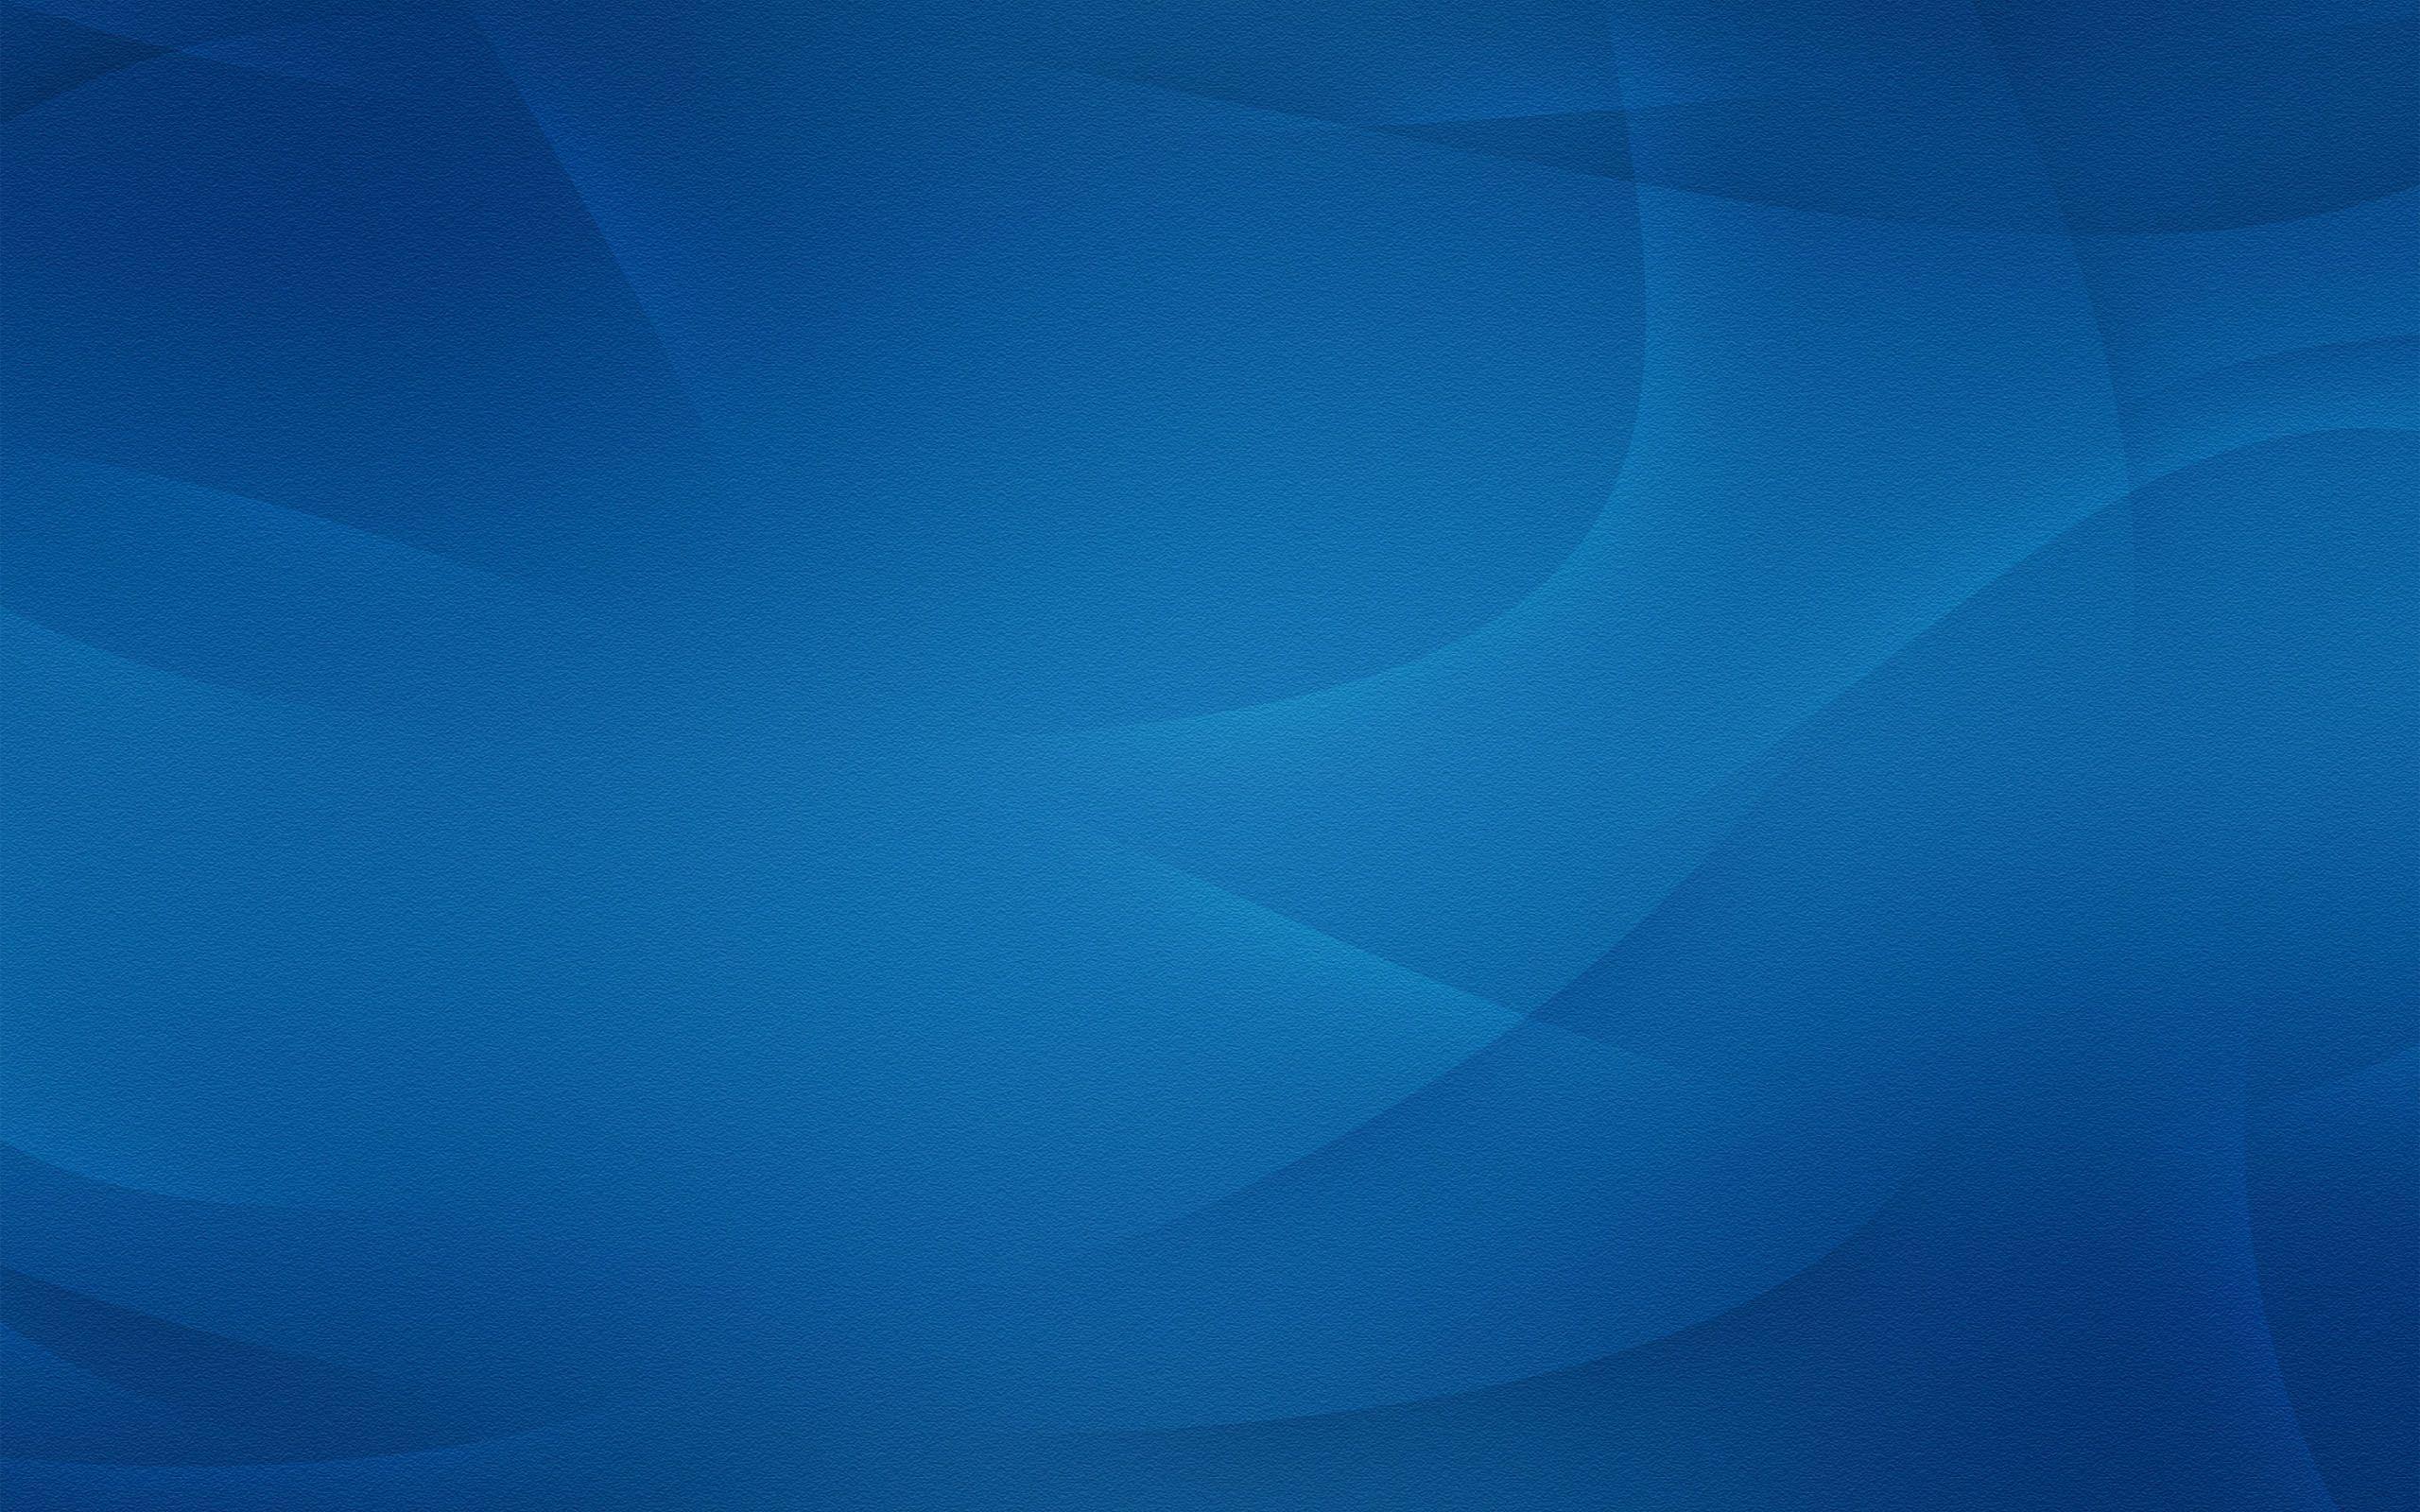 Wallpapers HD Blue - Wallpaper Cave